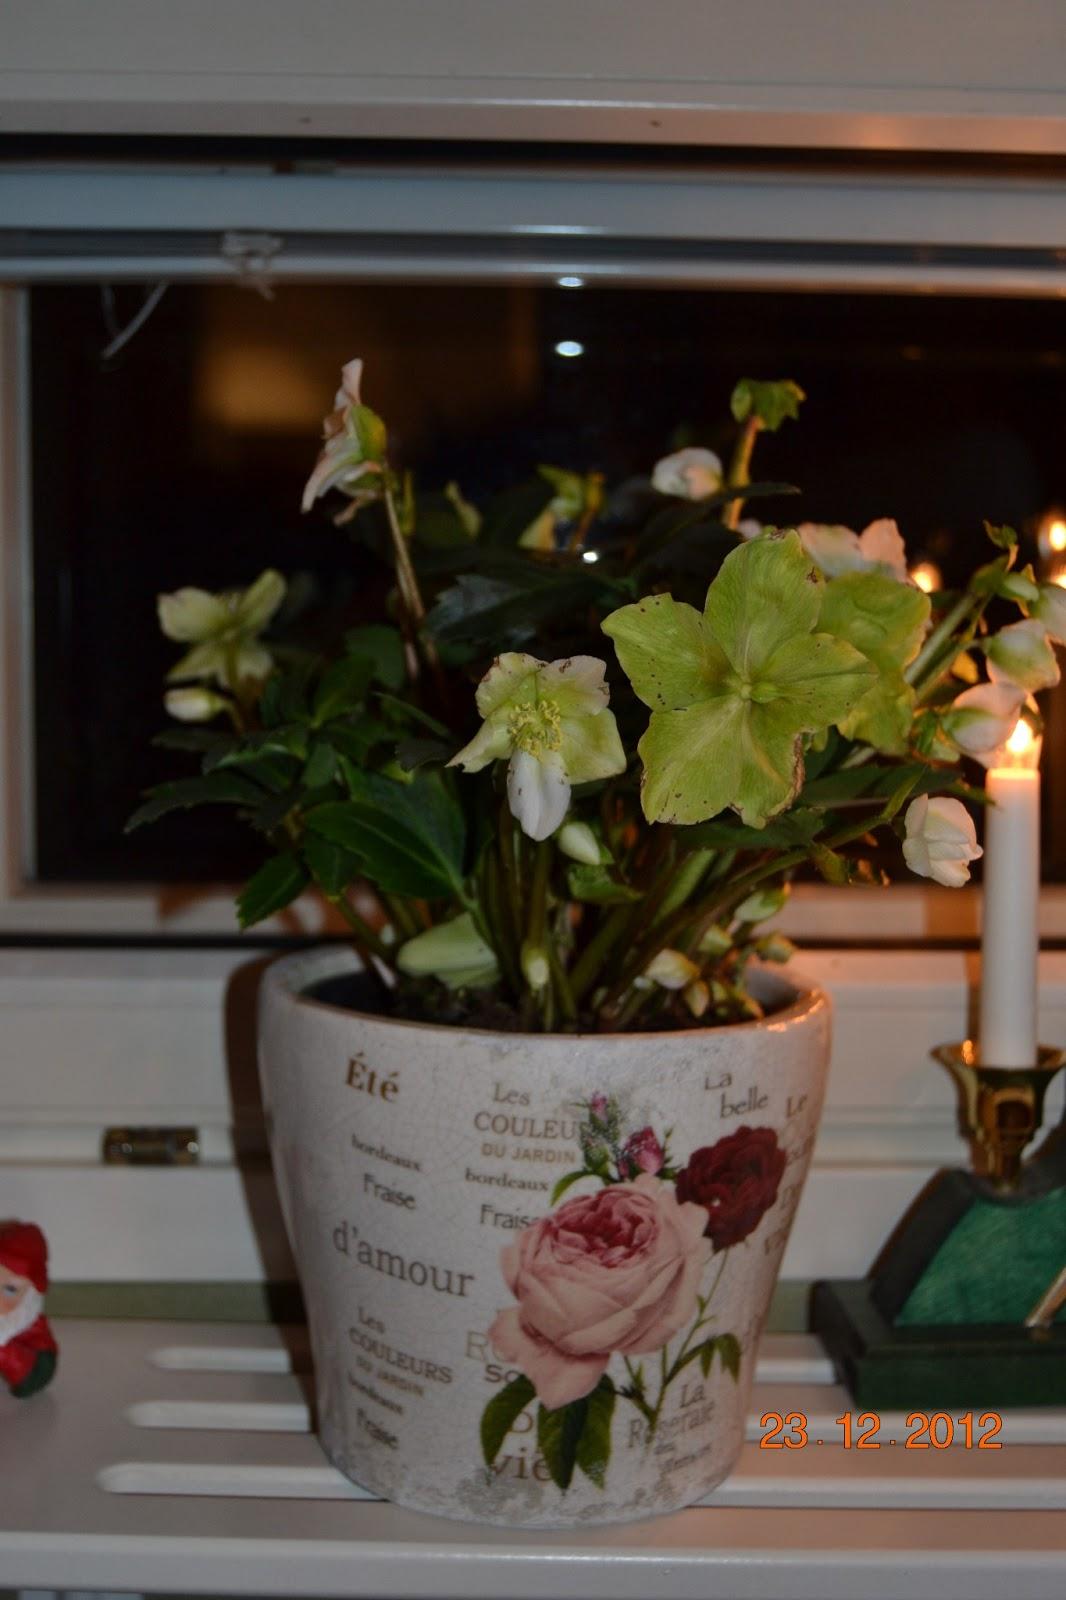 Jouluruusu – Christmas Star (Helleborus niger)